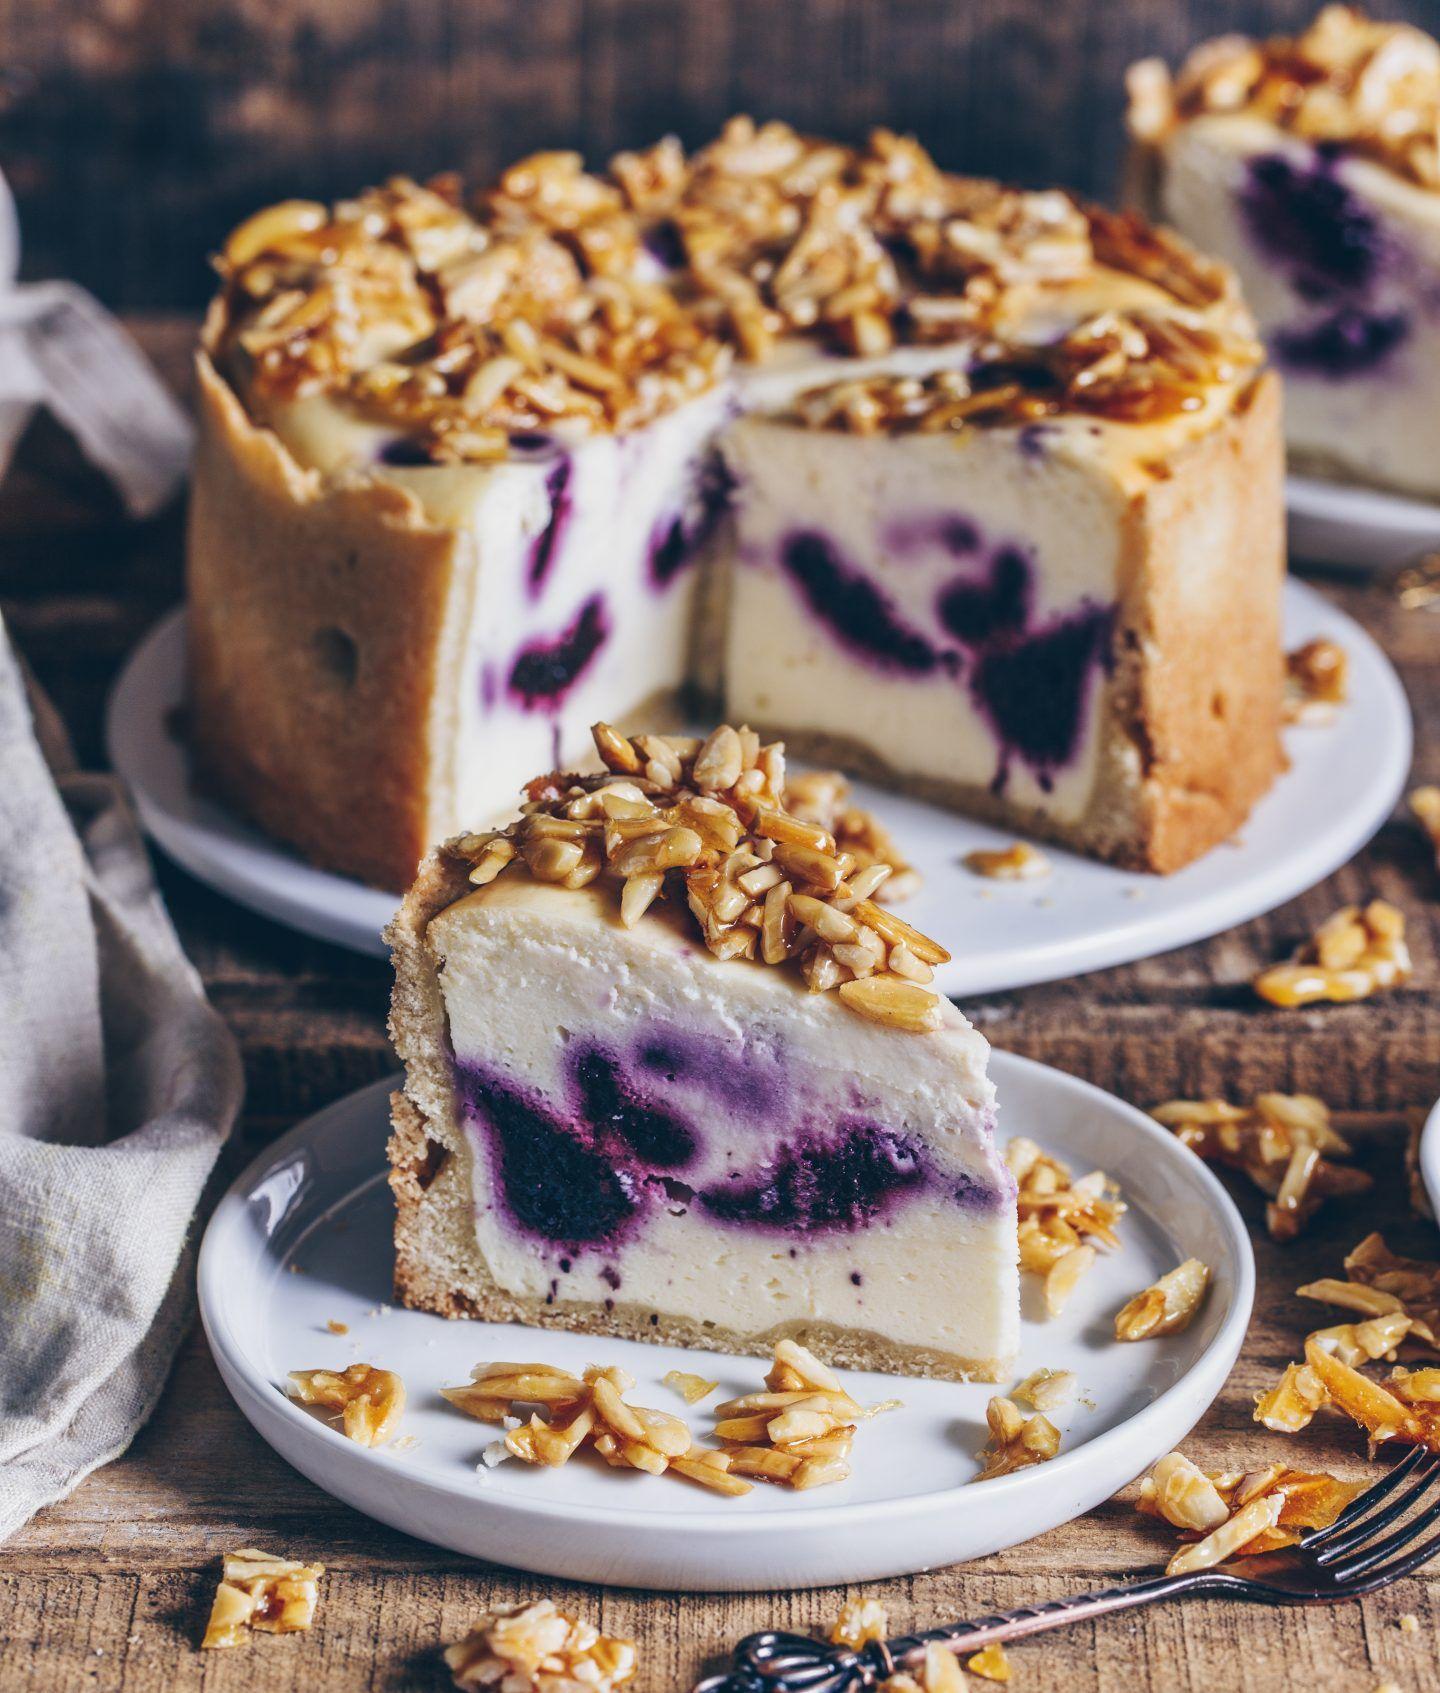 Vegan Blueberry Cheesecake with Almond Brittle - B